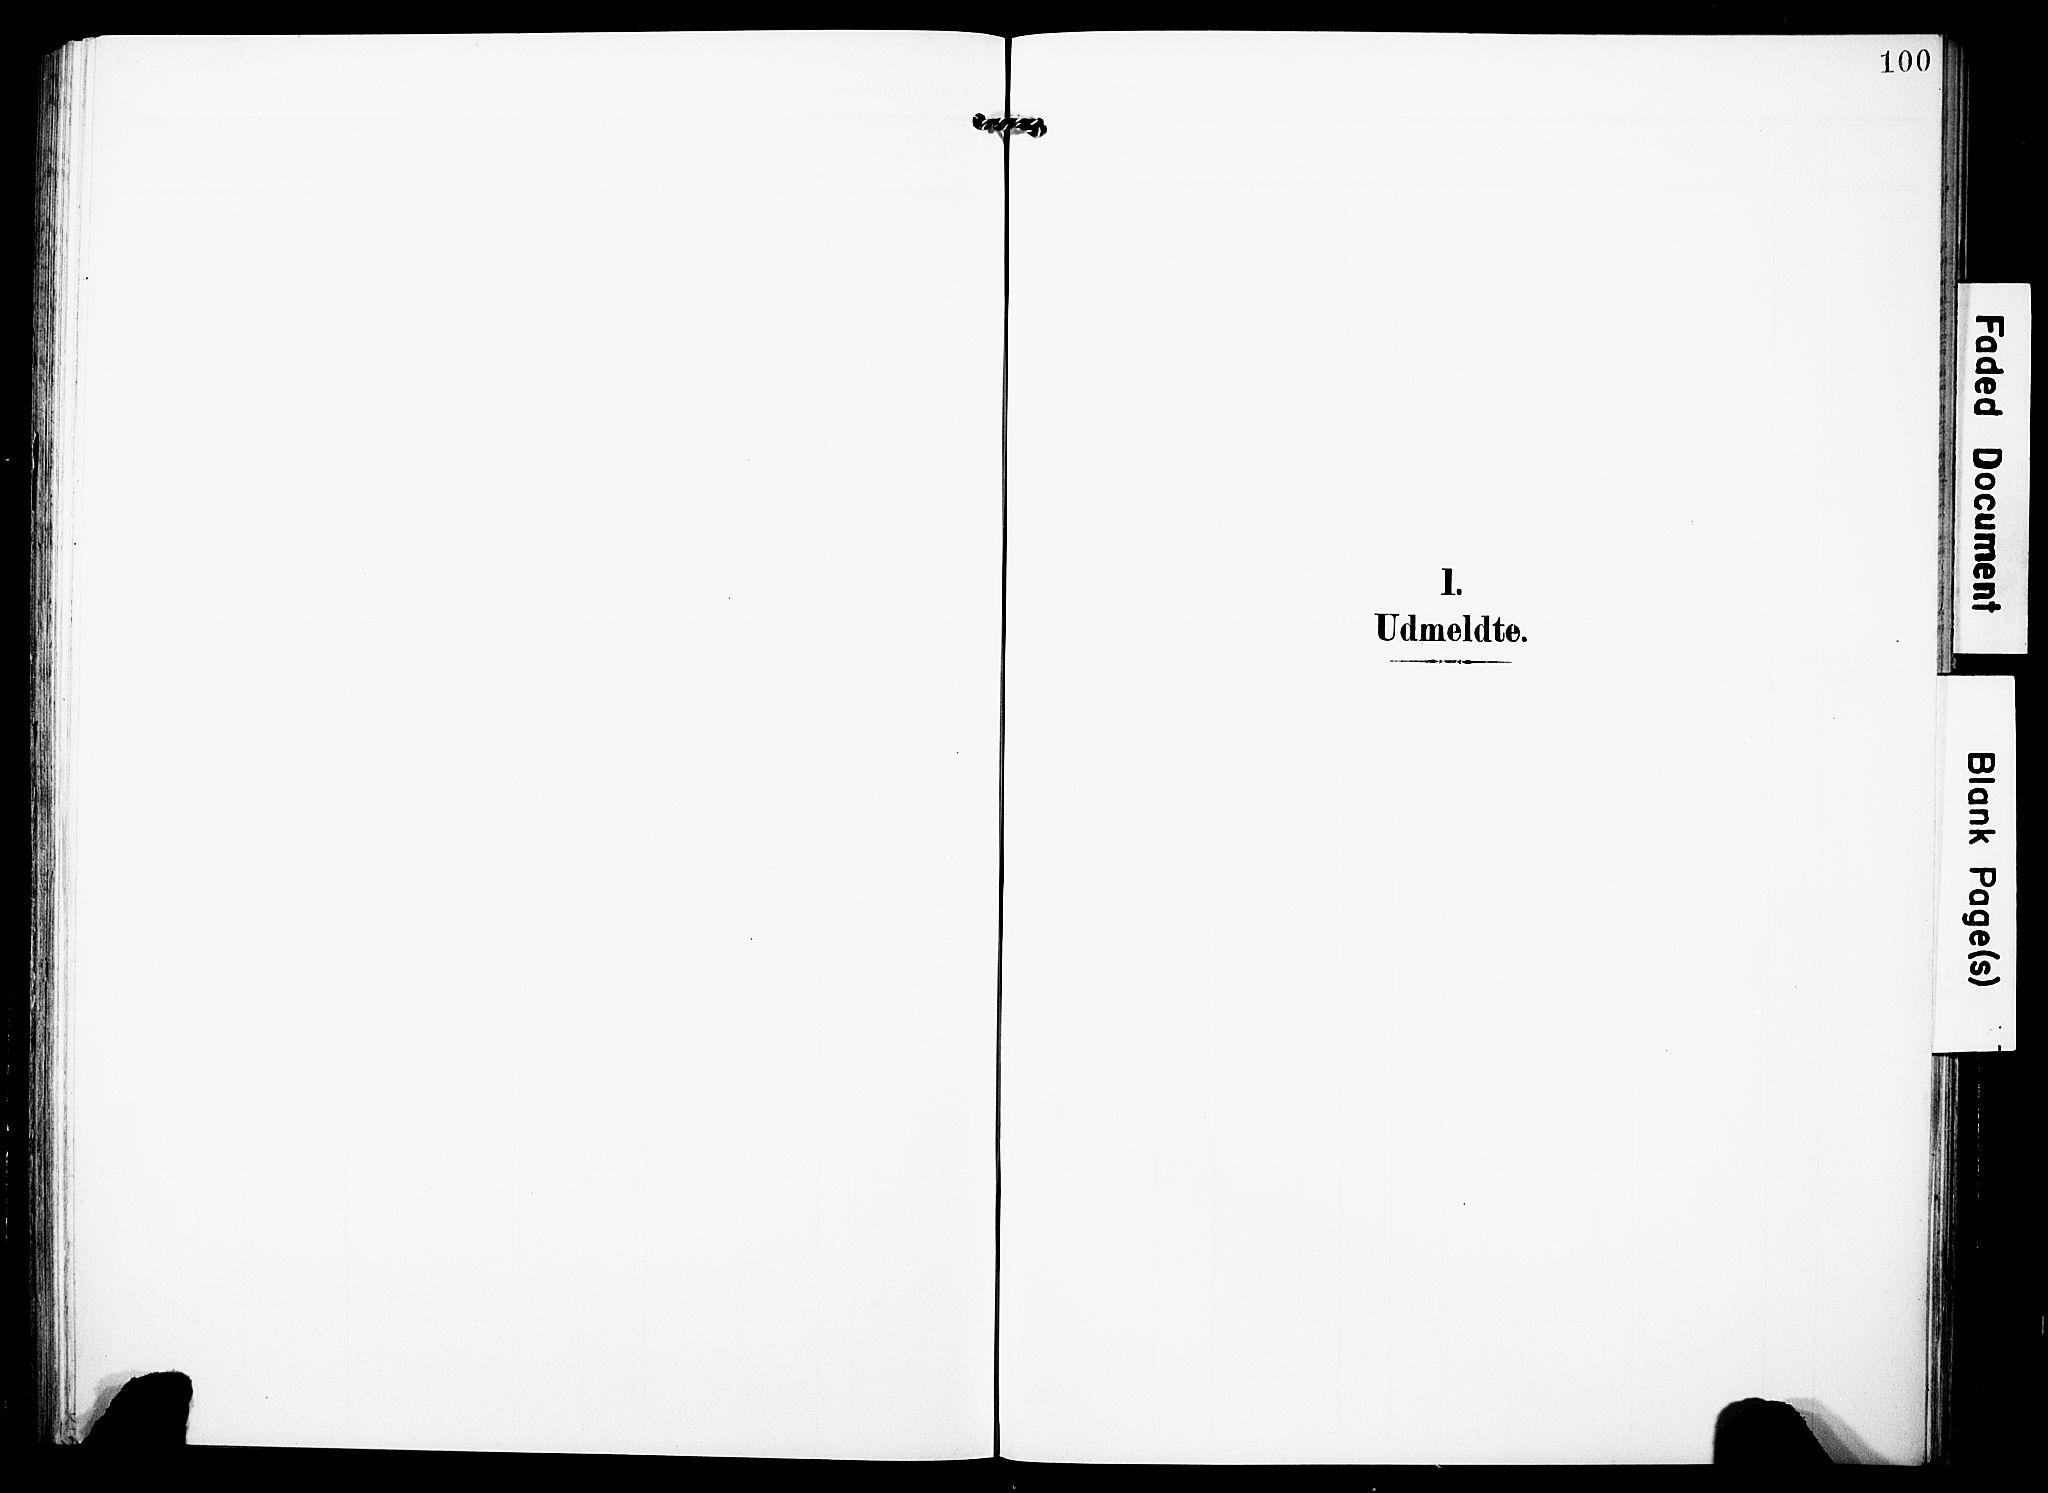 SAST, Torvastad sokneprestkontor, H/Ha/Haa/L0018: Ministerialbok nr. A 17, 1903-1925, s. 100